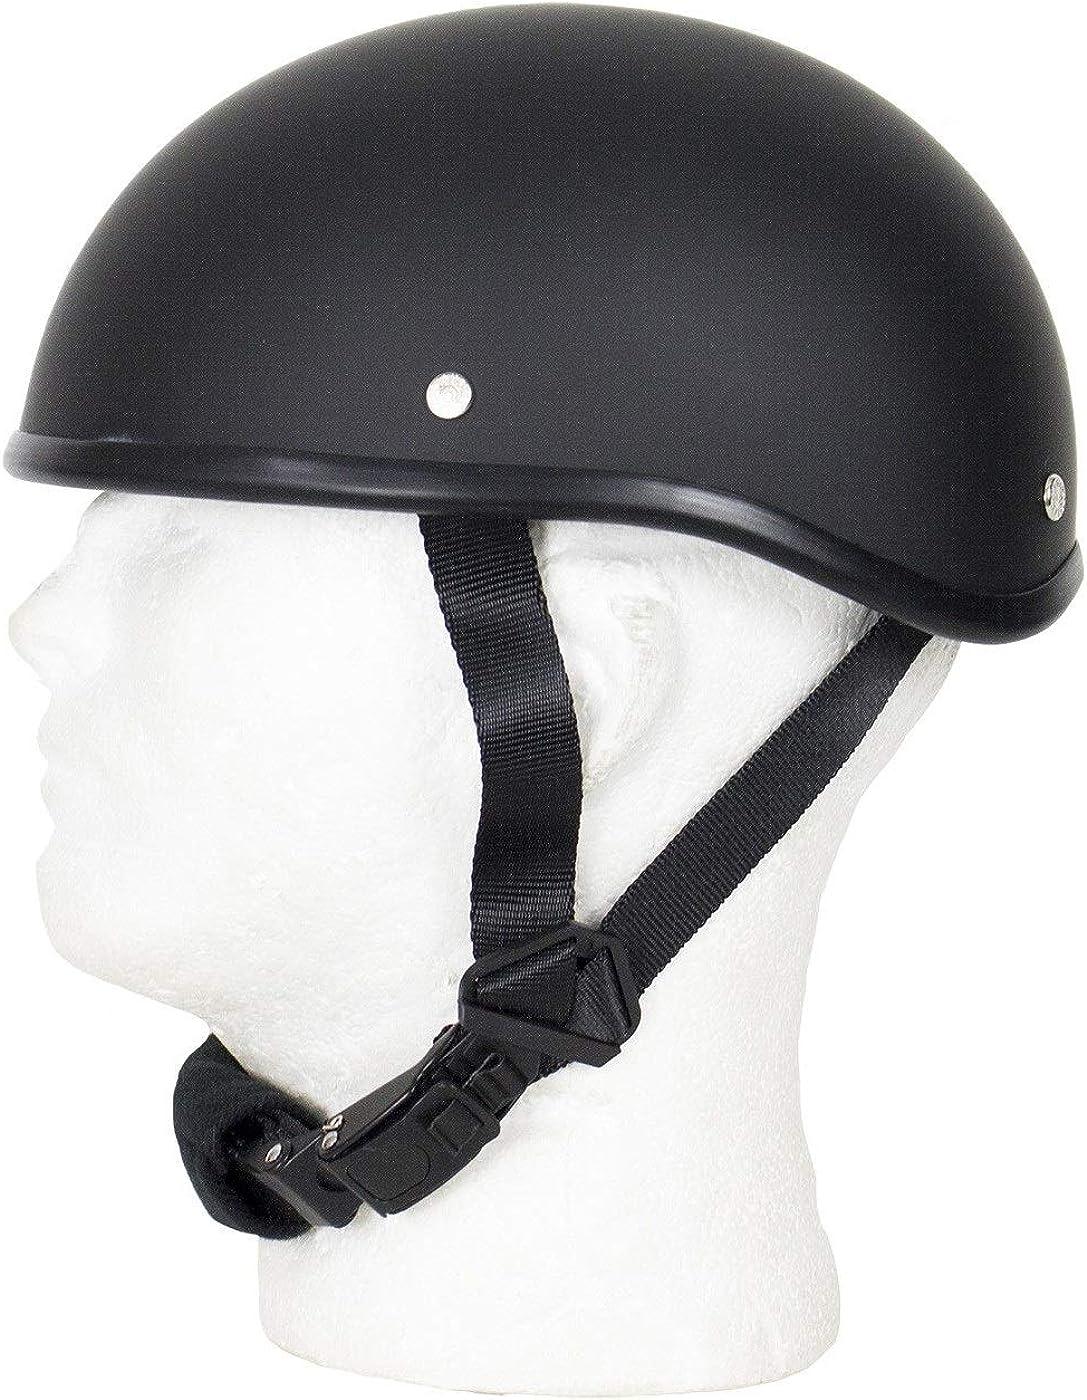 SOA Beanie Novelty Skull Cap Flat Black